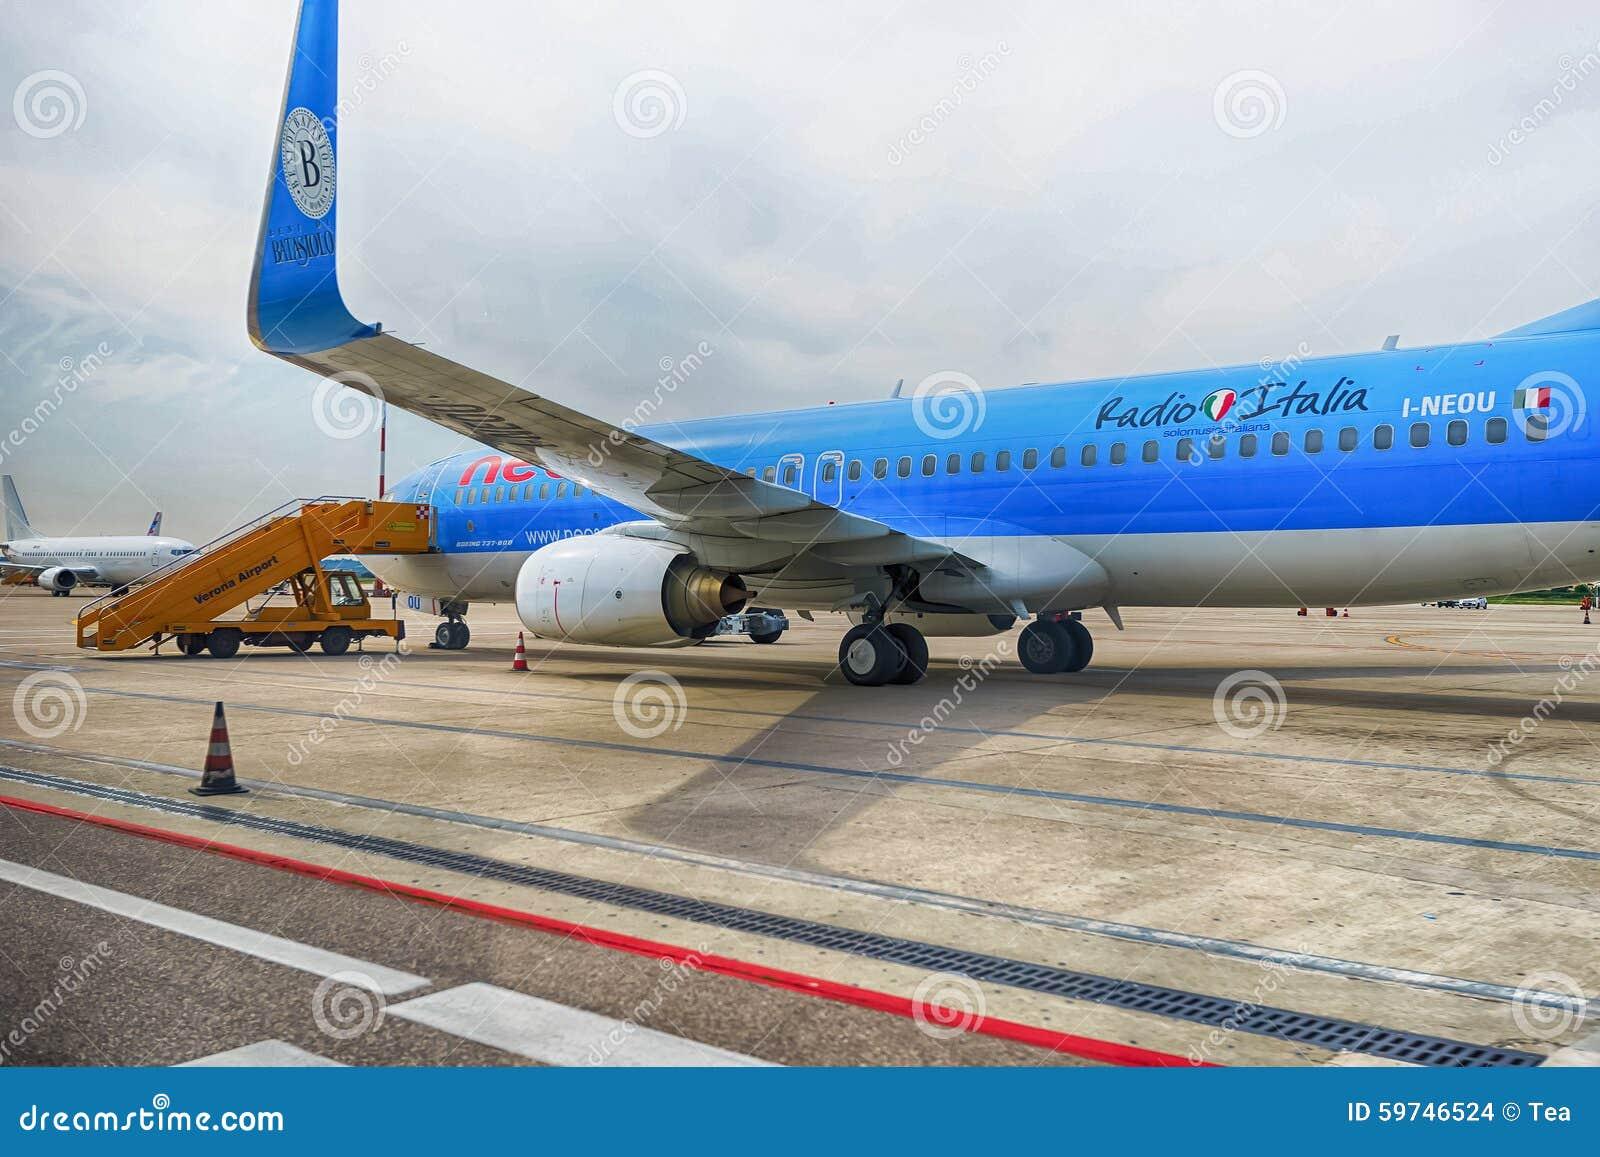 Jet Flight In Verona Airport Editorial Stock Image - Image ...